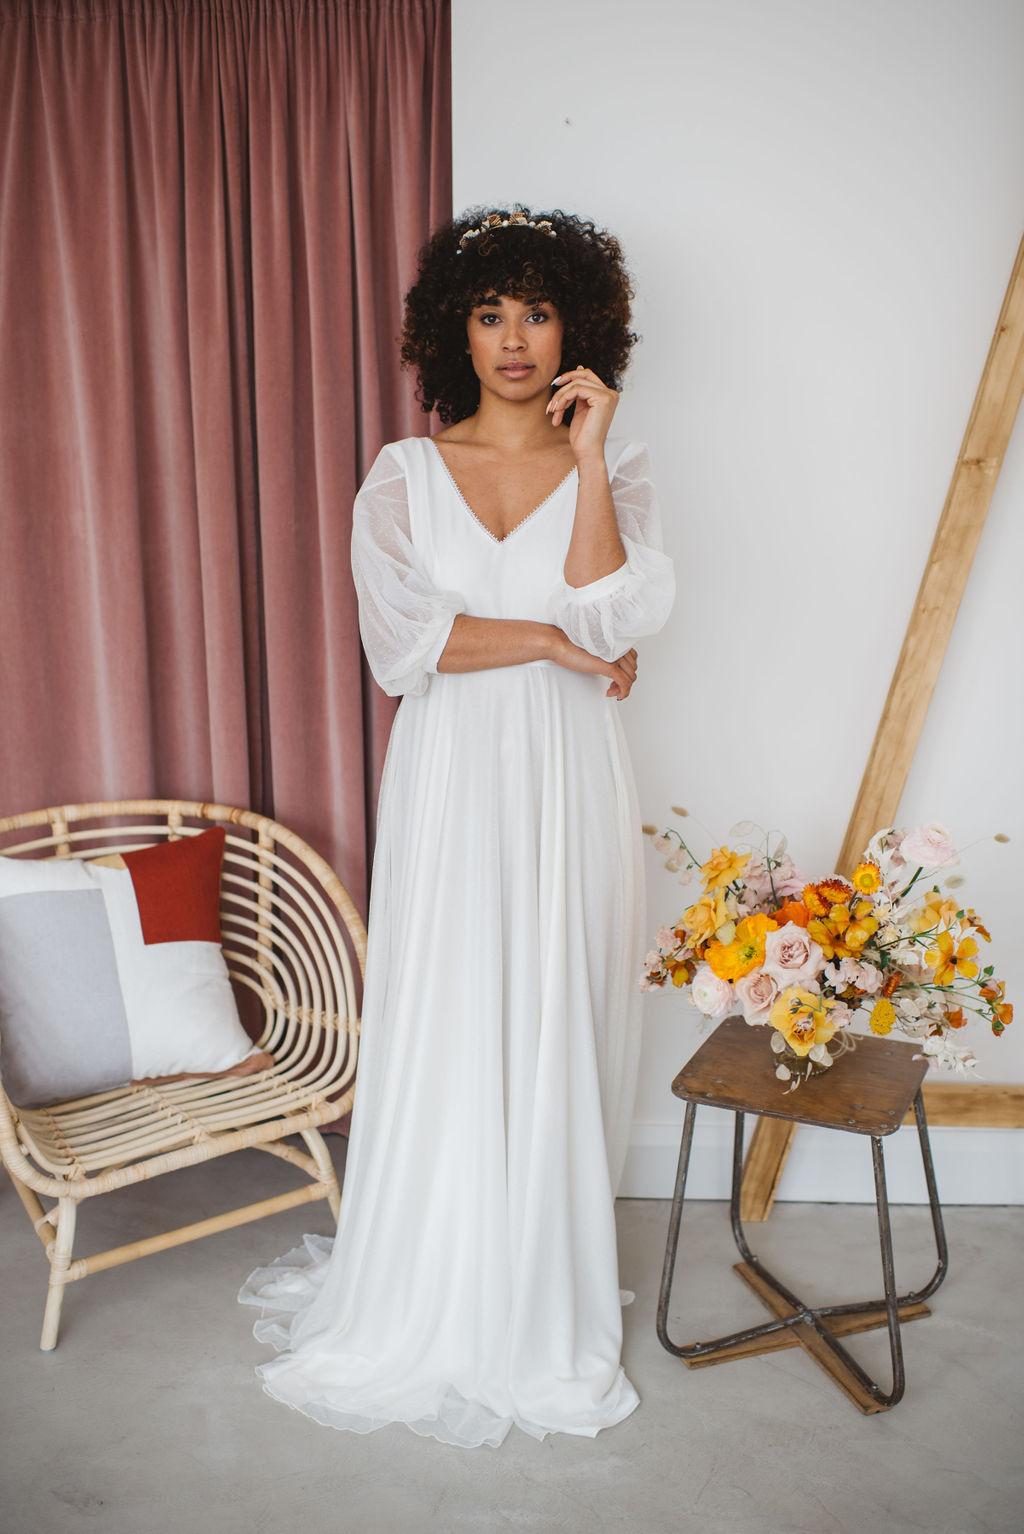 statement sleeve wedding dresses at archive 12 belfast